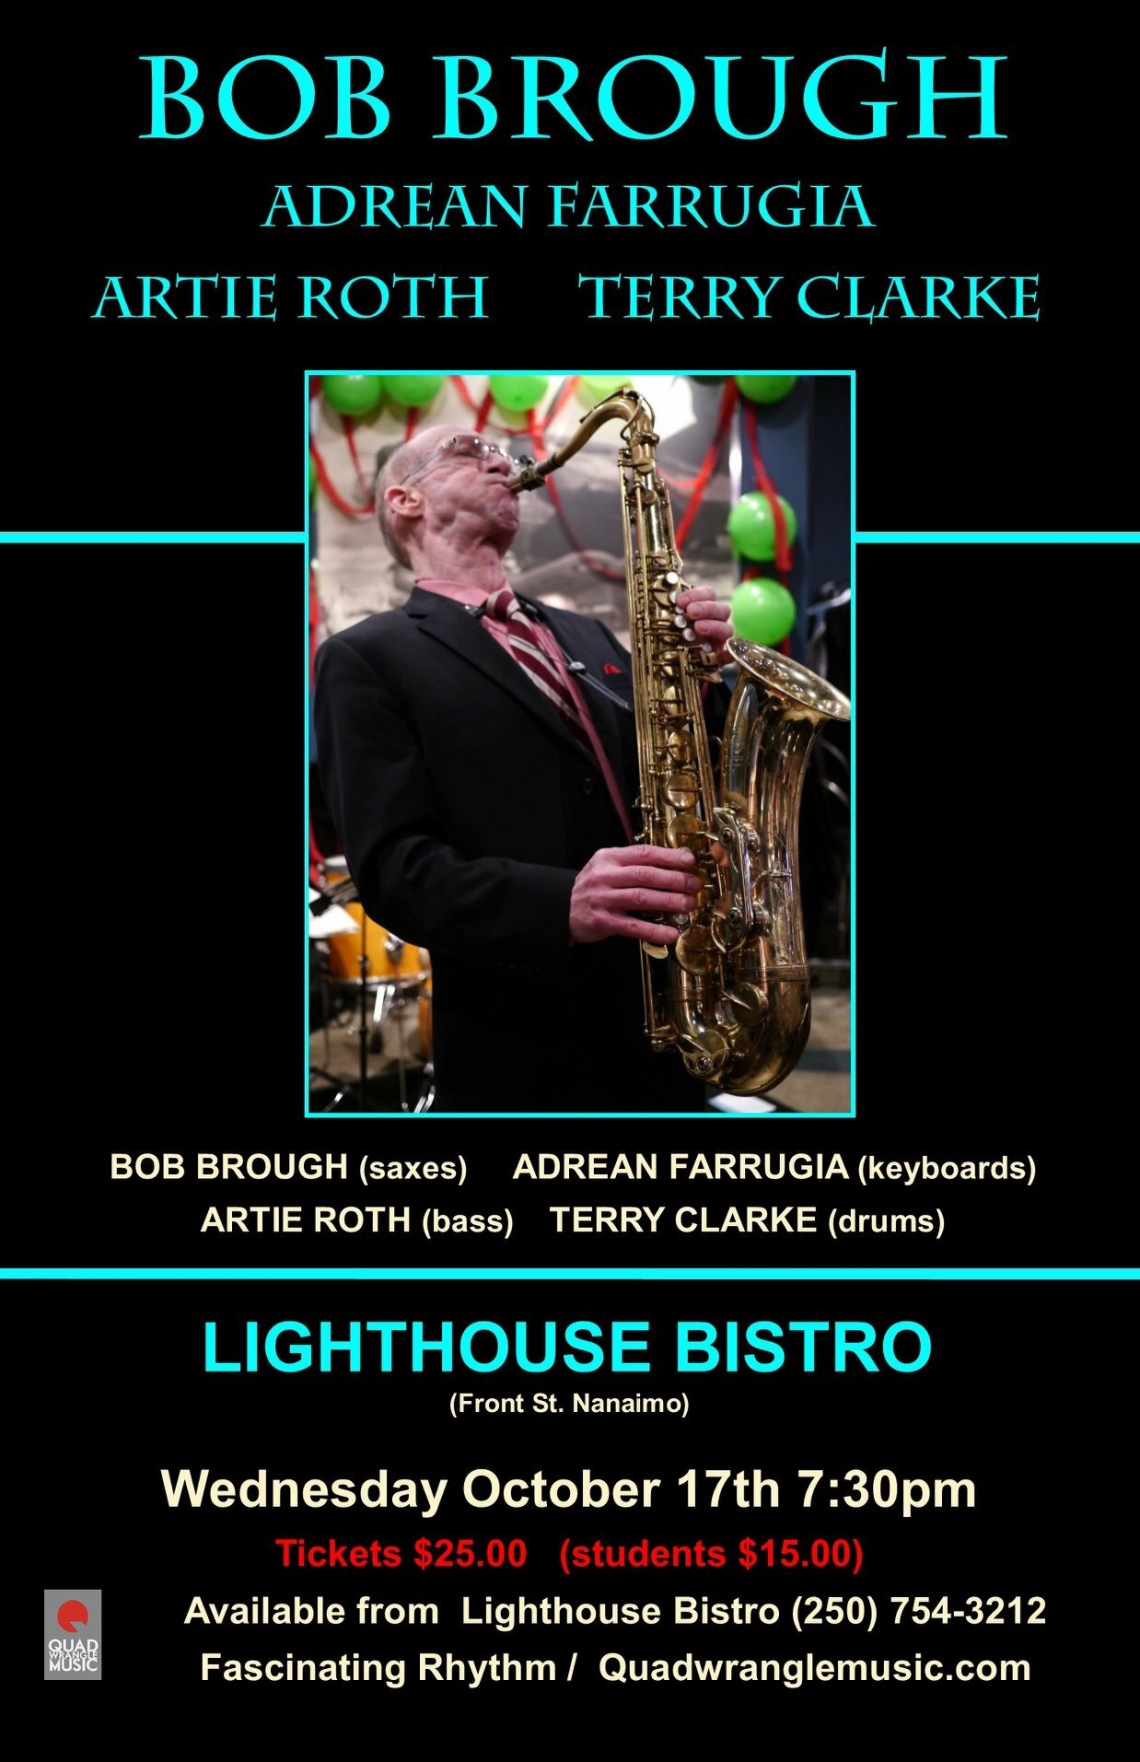 Jazz Workshop with the Bob Brough Quintet